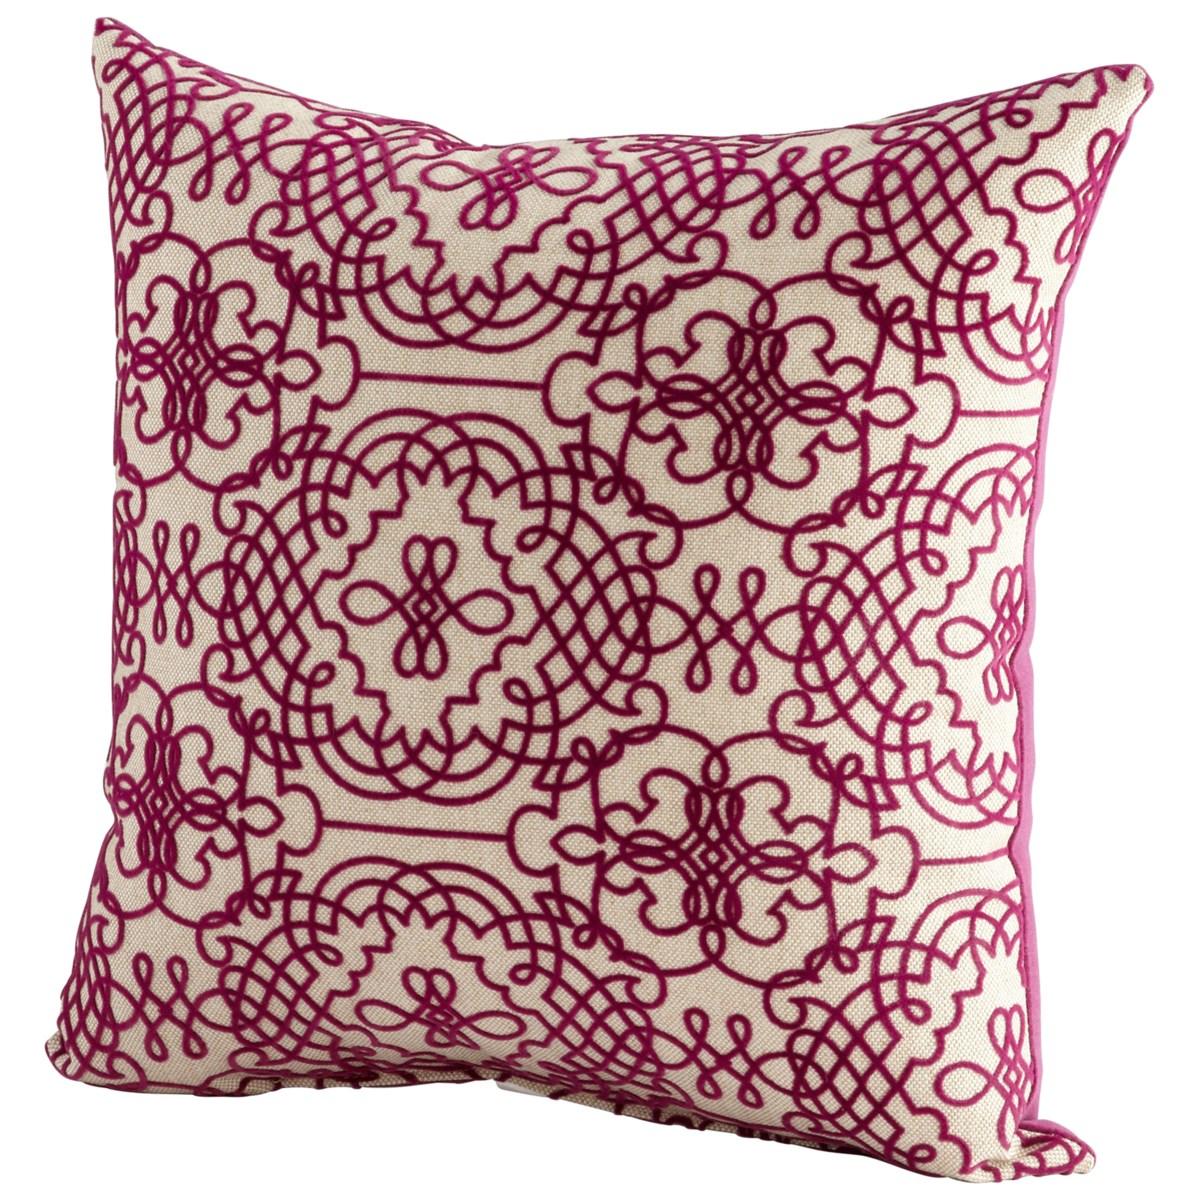 St. Lucia Pillow